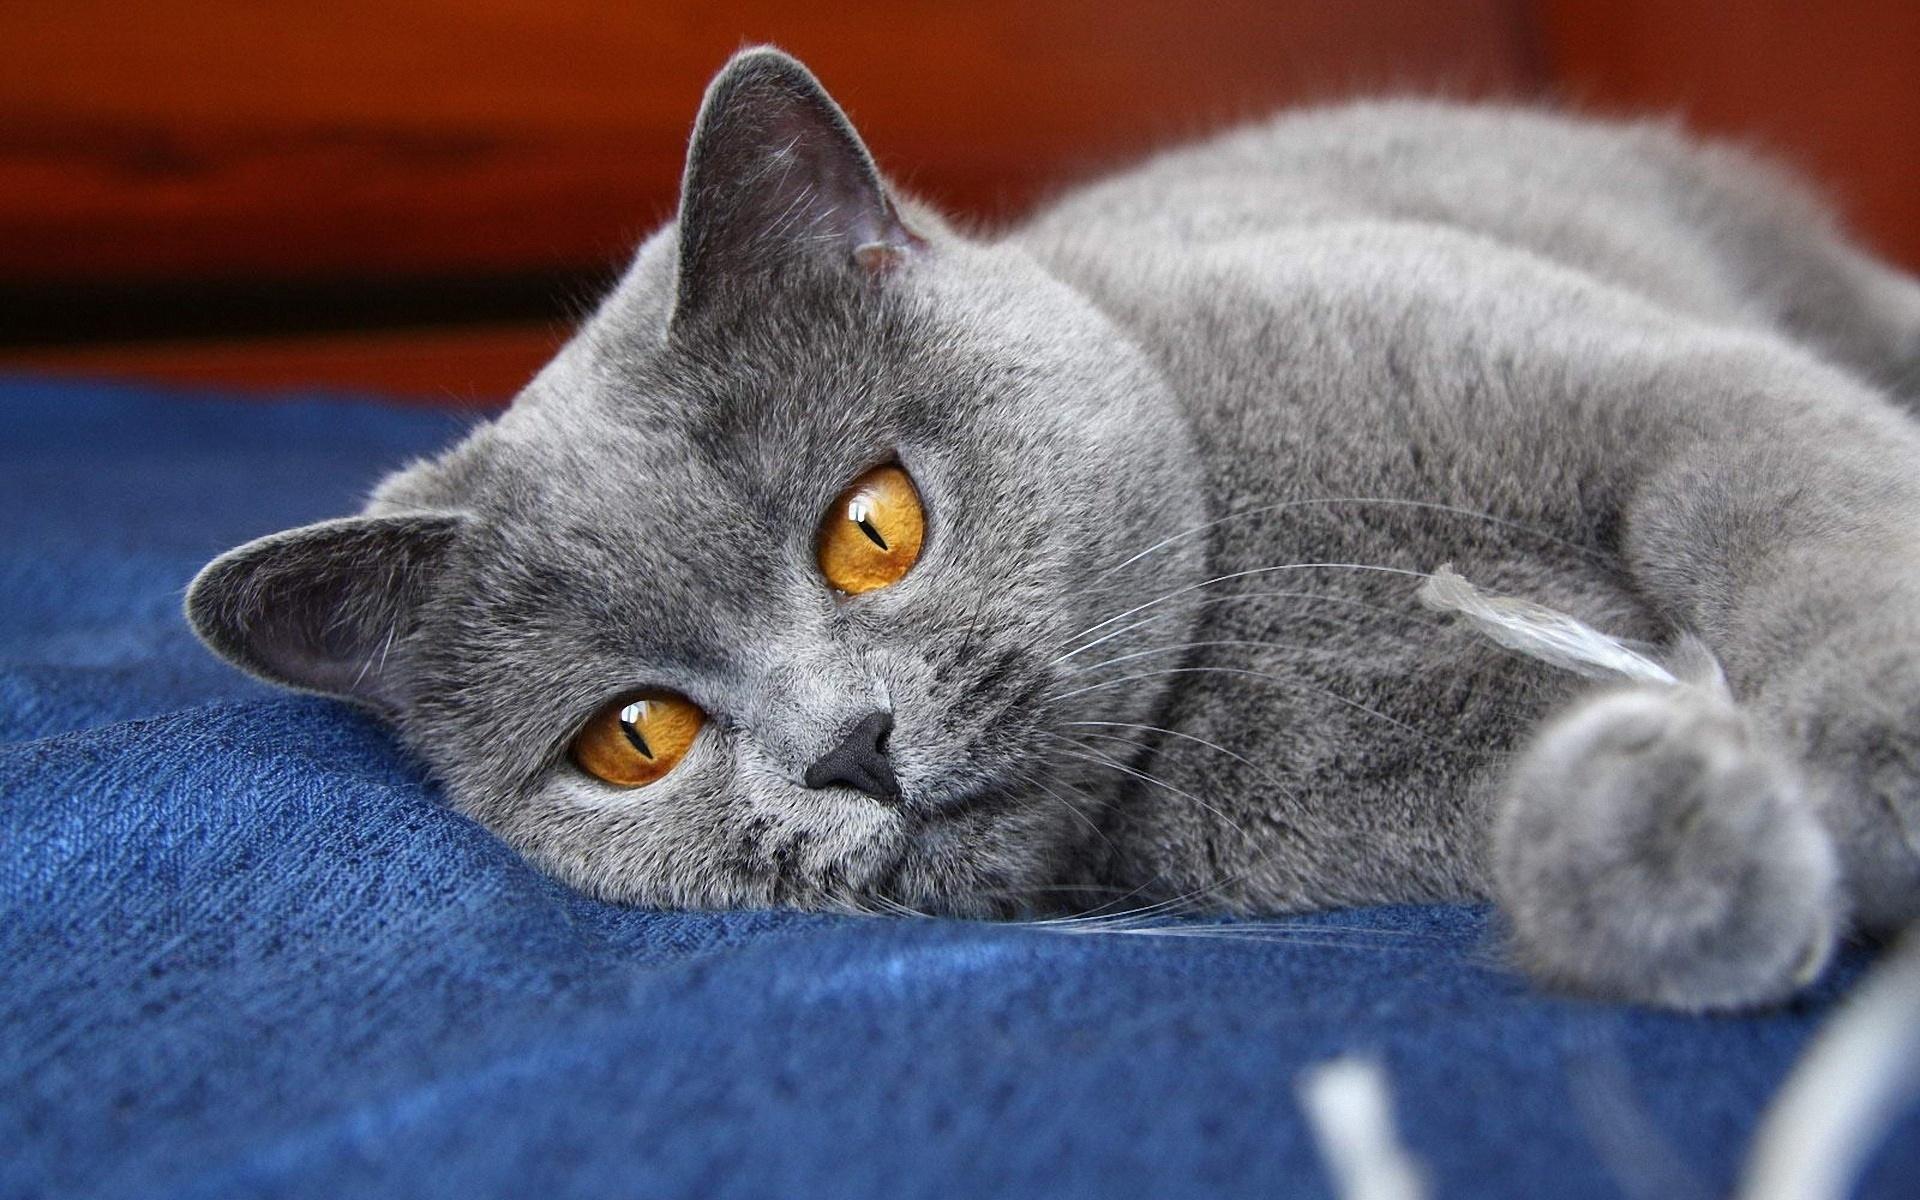 Смешные коты британцы картинки, открытку